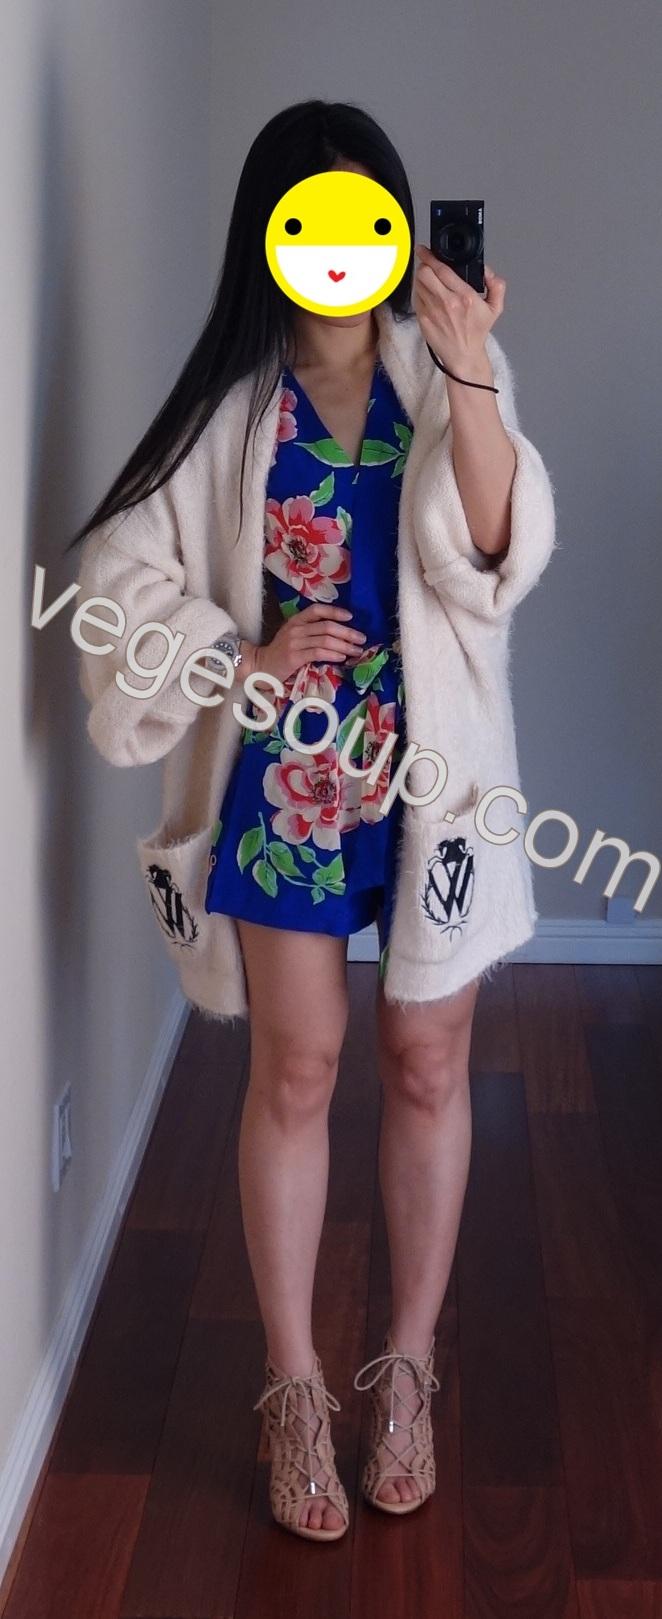 da0b4ac9ee423 白色軟毛衣外套  Wildfox Classic Logo Cardigan - Vintage Lace(XS) 連身褲裝  Yumi Kim Liz  Silk Romper - Dodger Blue Rosebud(XS其他花色點這裡)